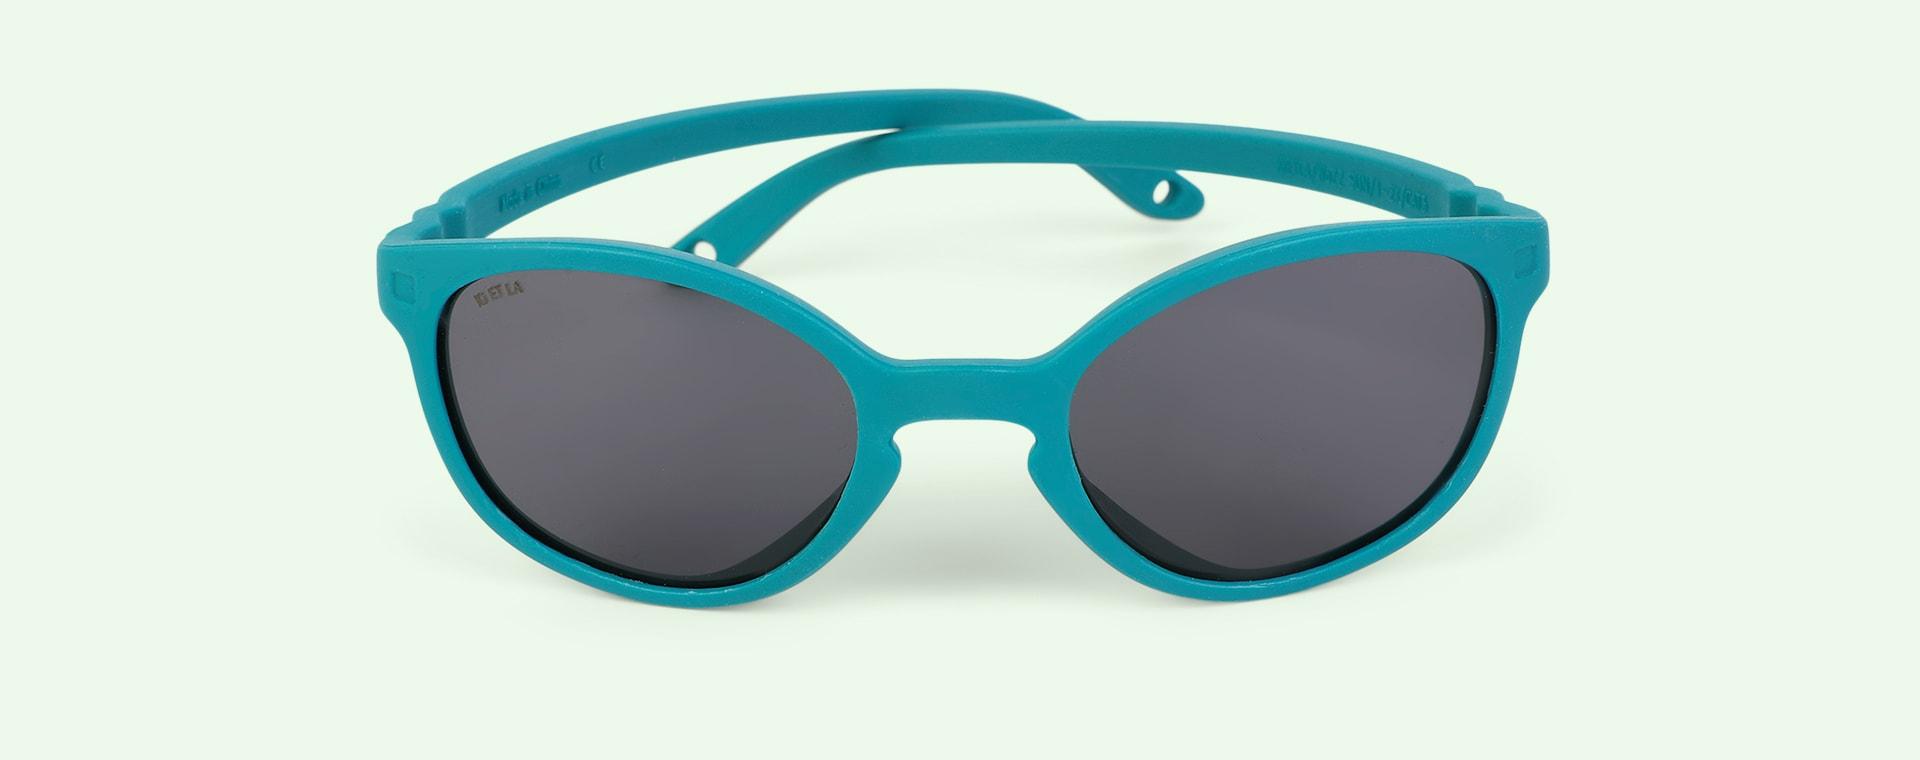 Peacock Ki ET LA WAZZ Wayfarer Sunglasses